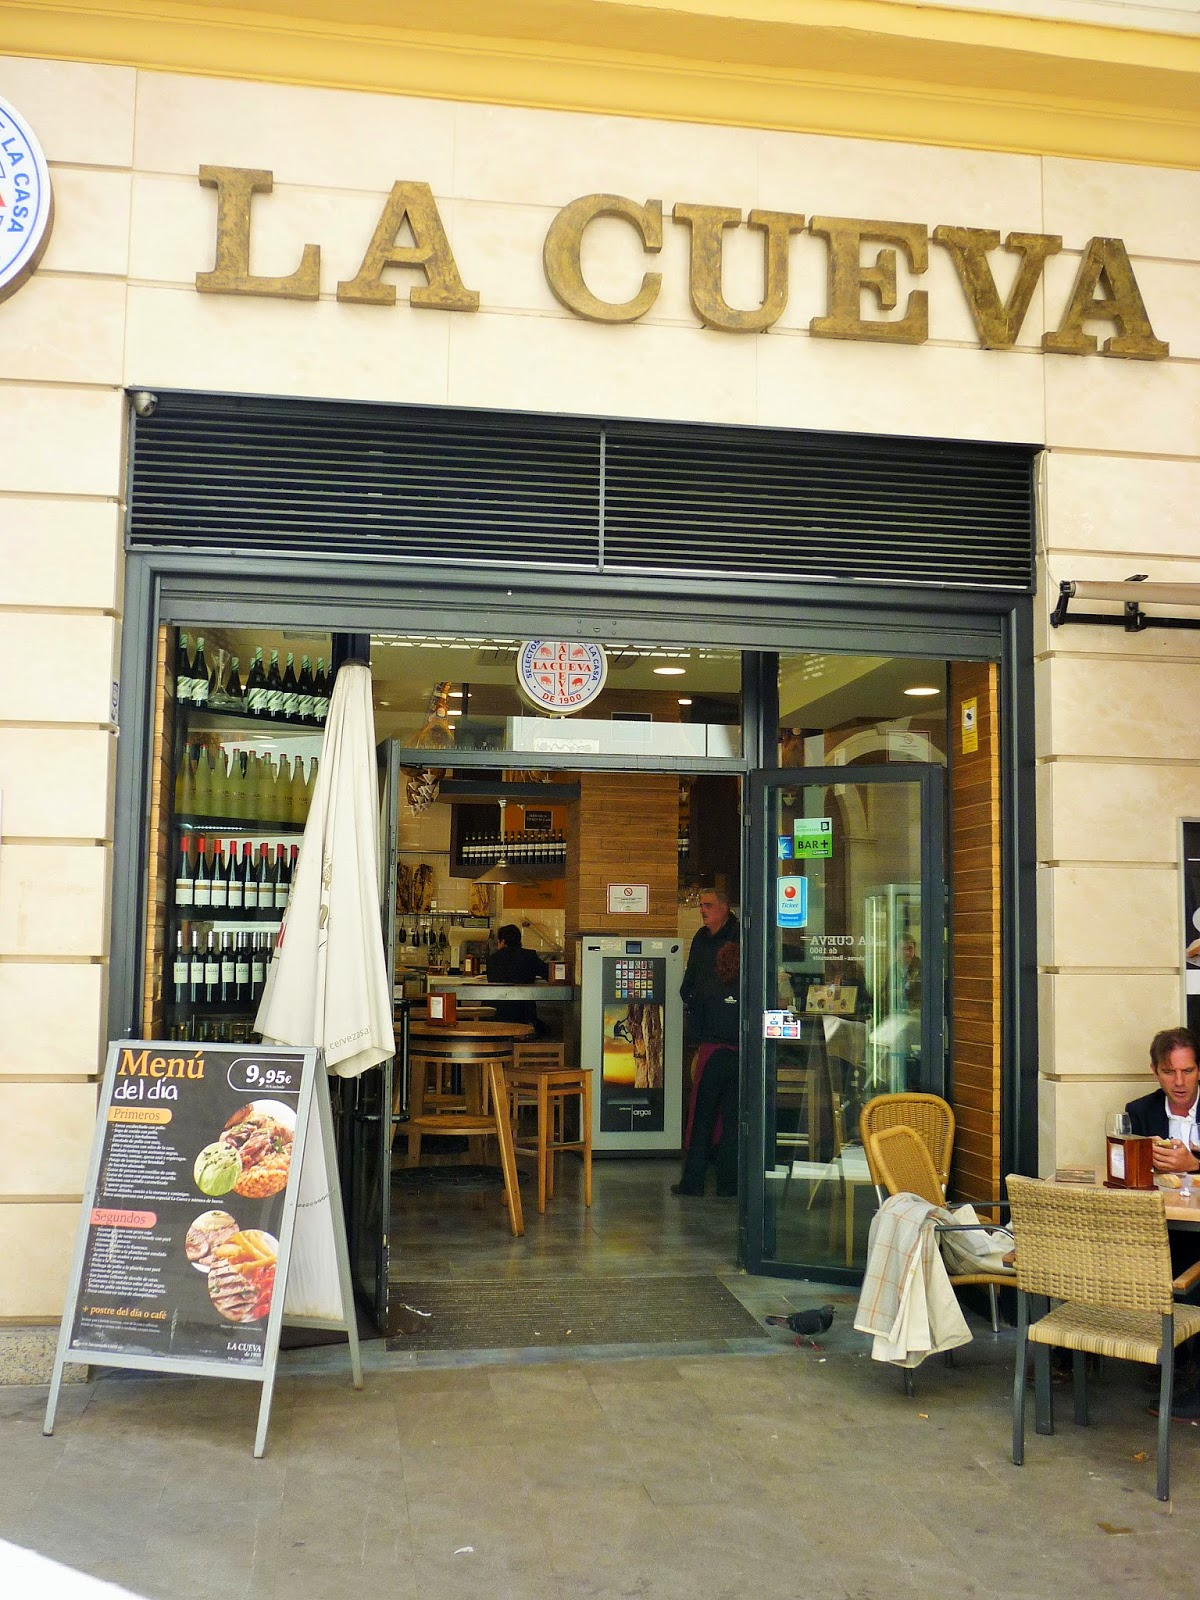 Restaurant - tapas - La Cueva de 1900 - Malaga - Espagne